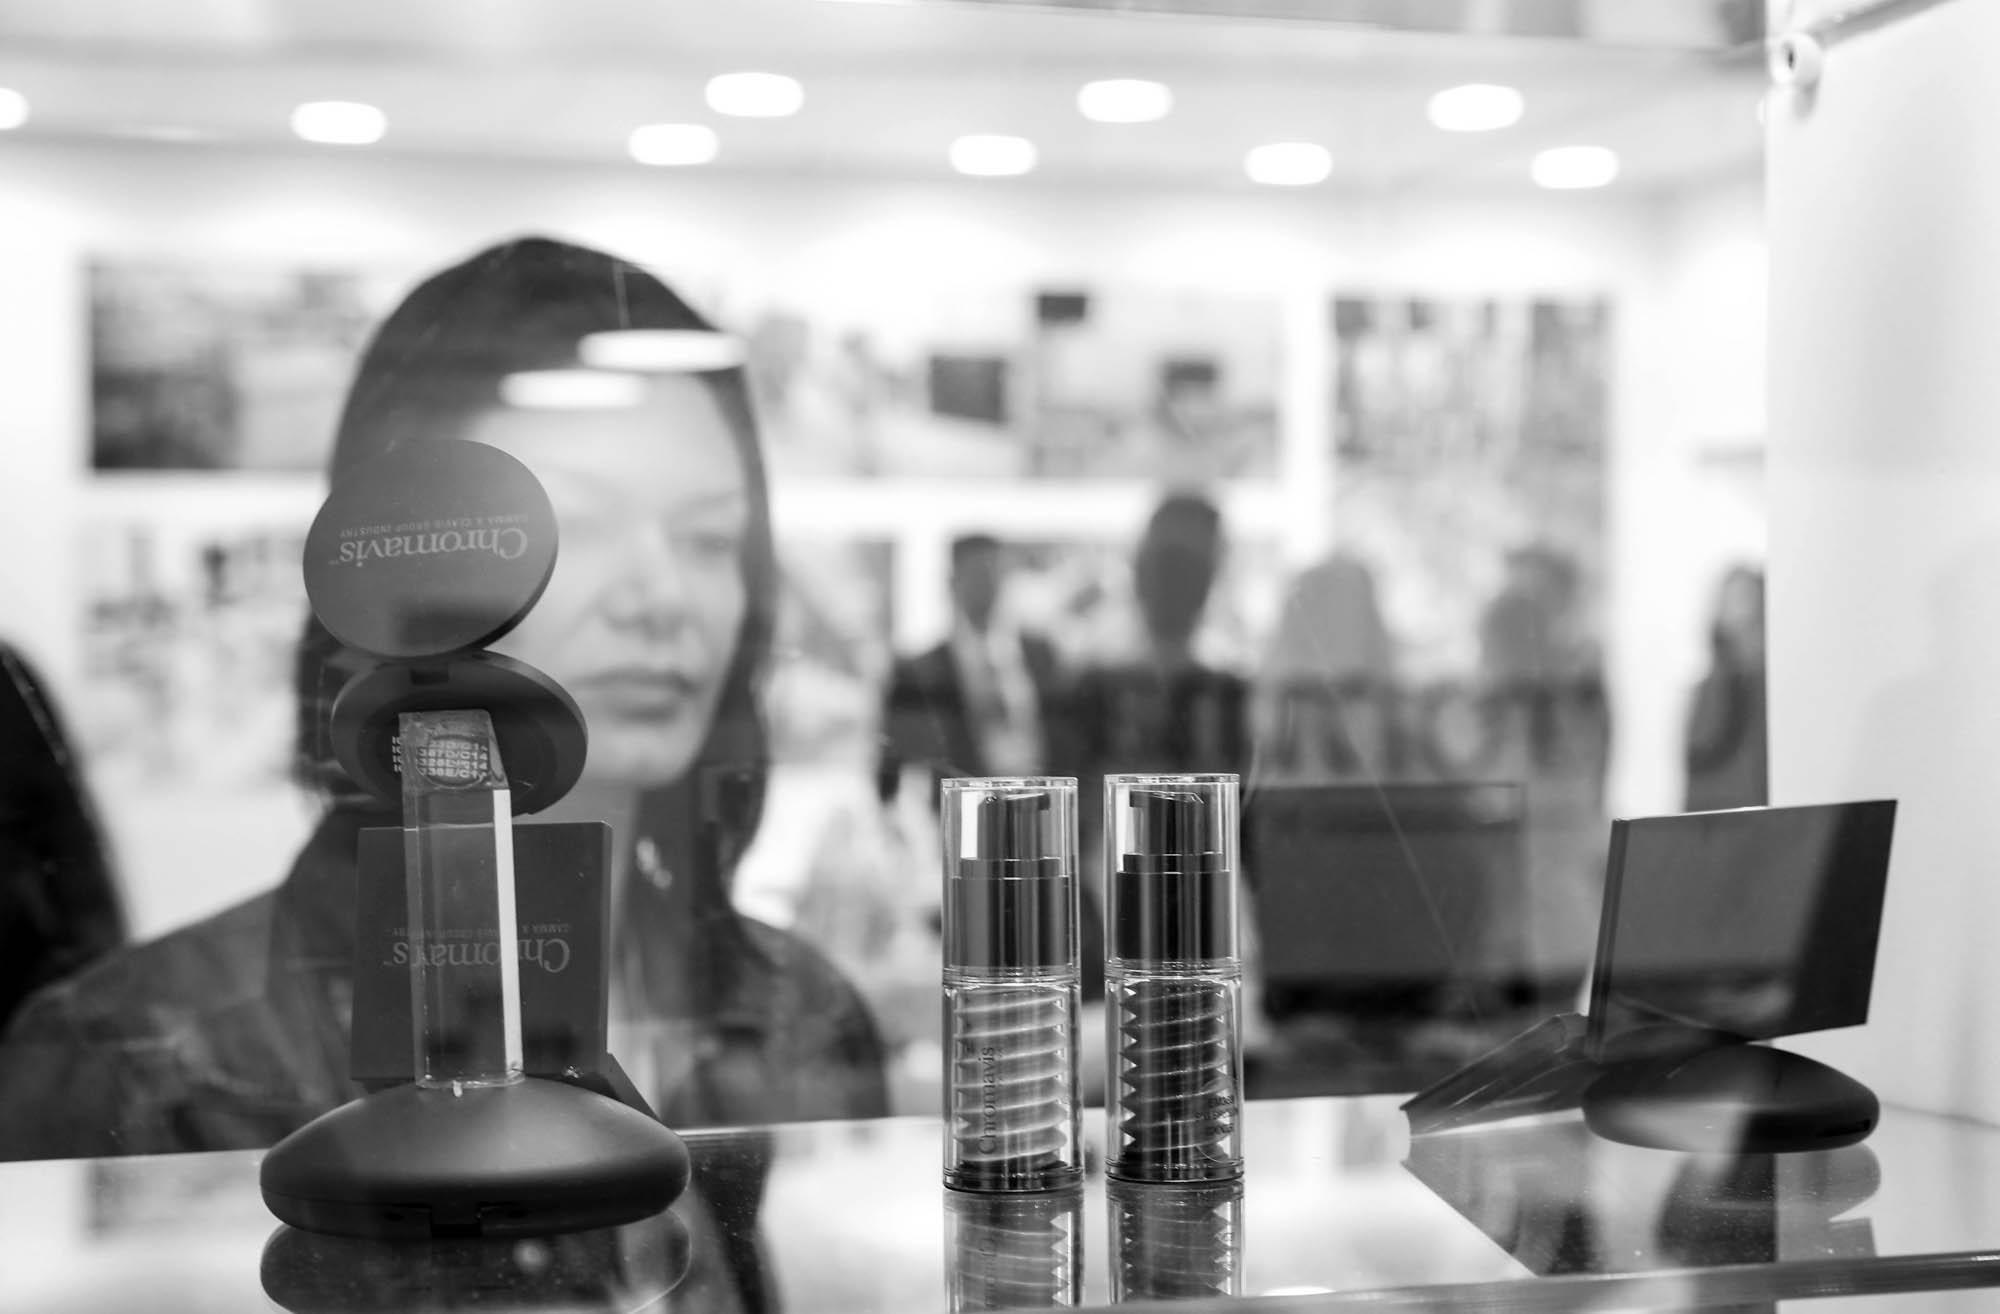 Feira FCE Cosmetique